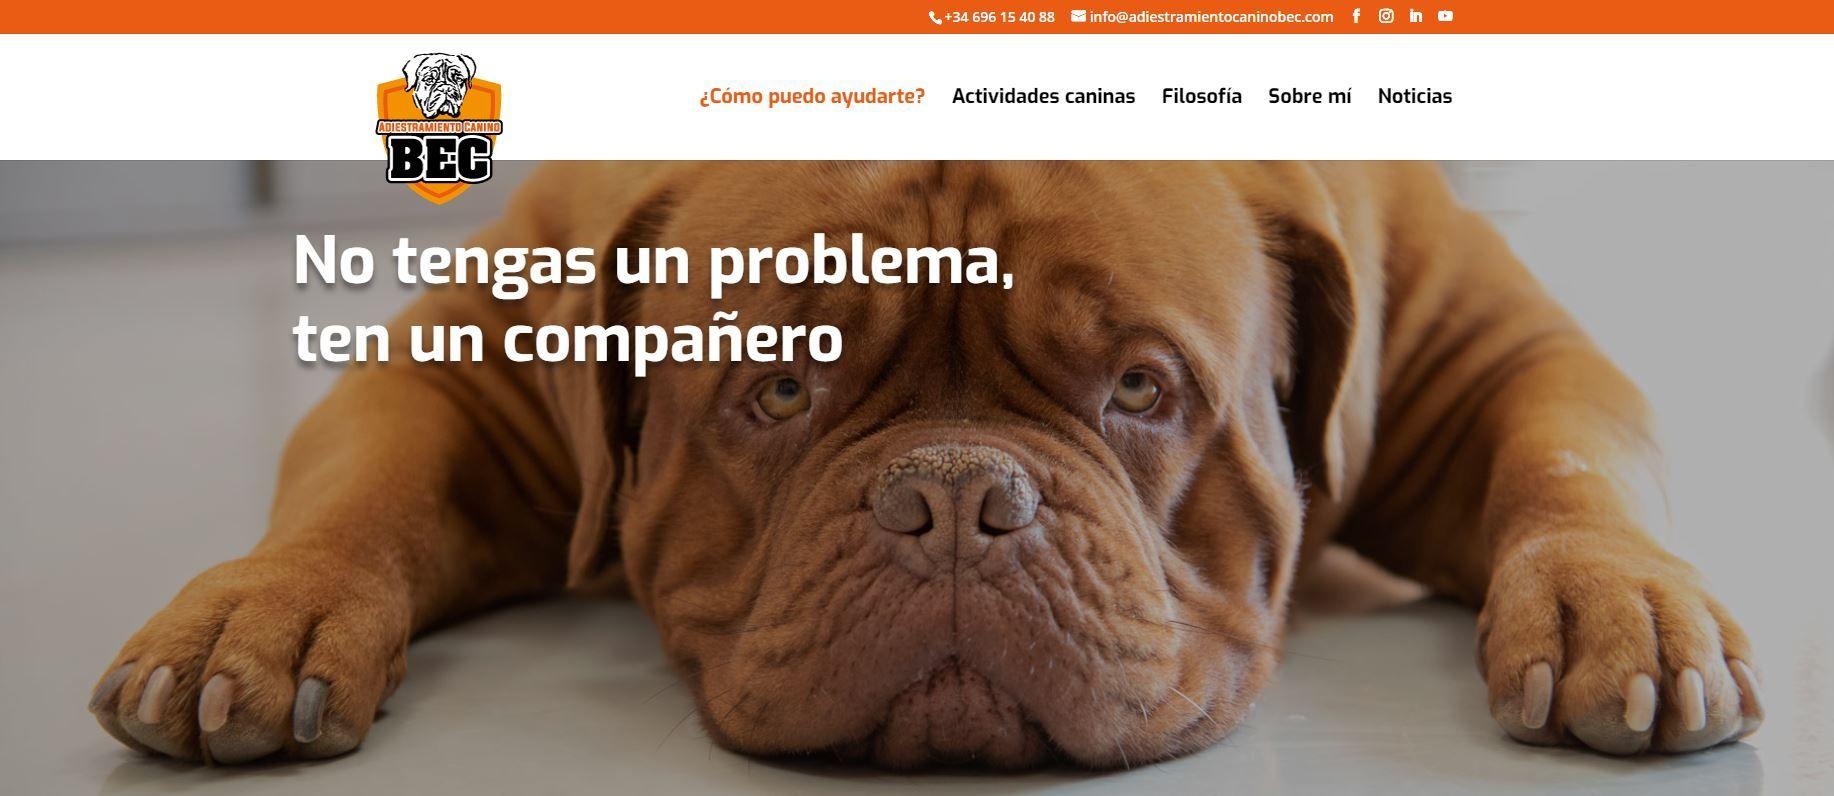 Pagina-web-Adiestramiento-canino-BEC_Filosofia